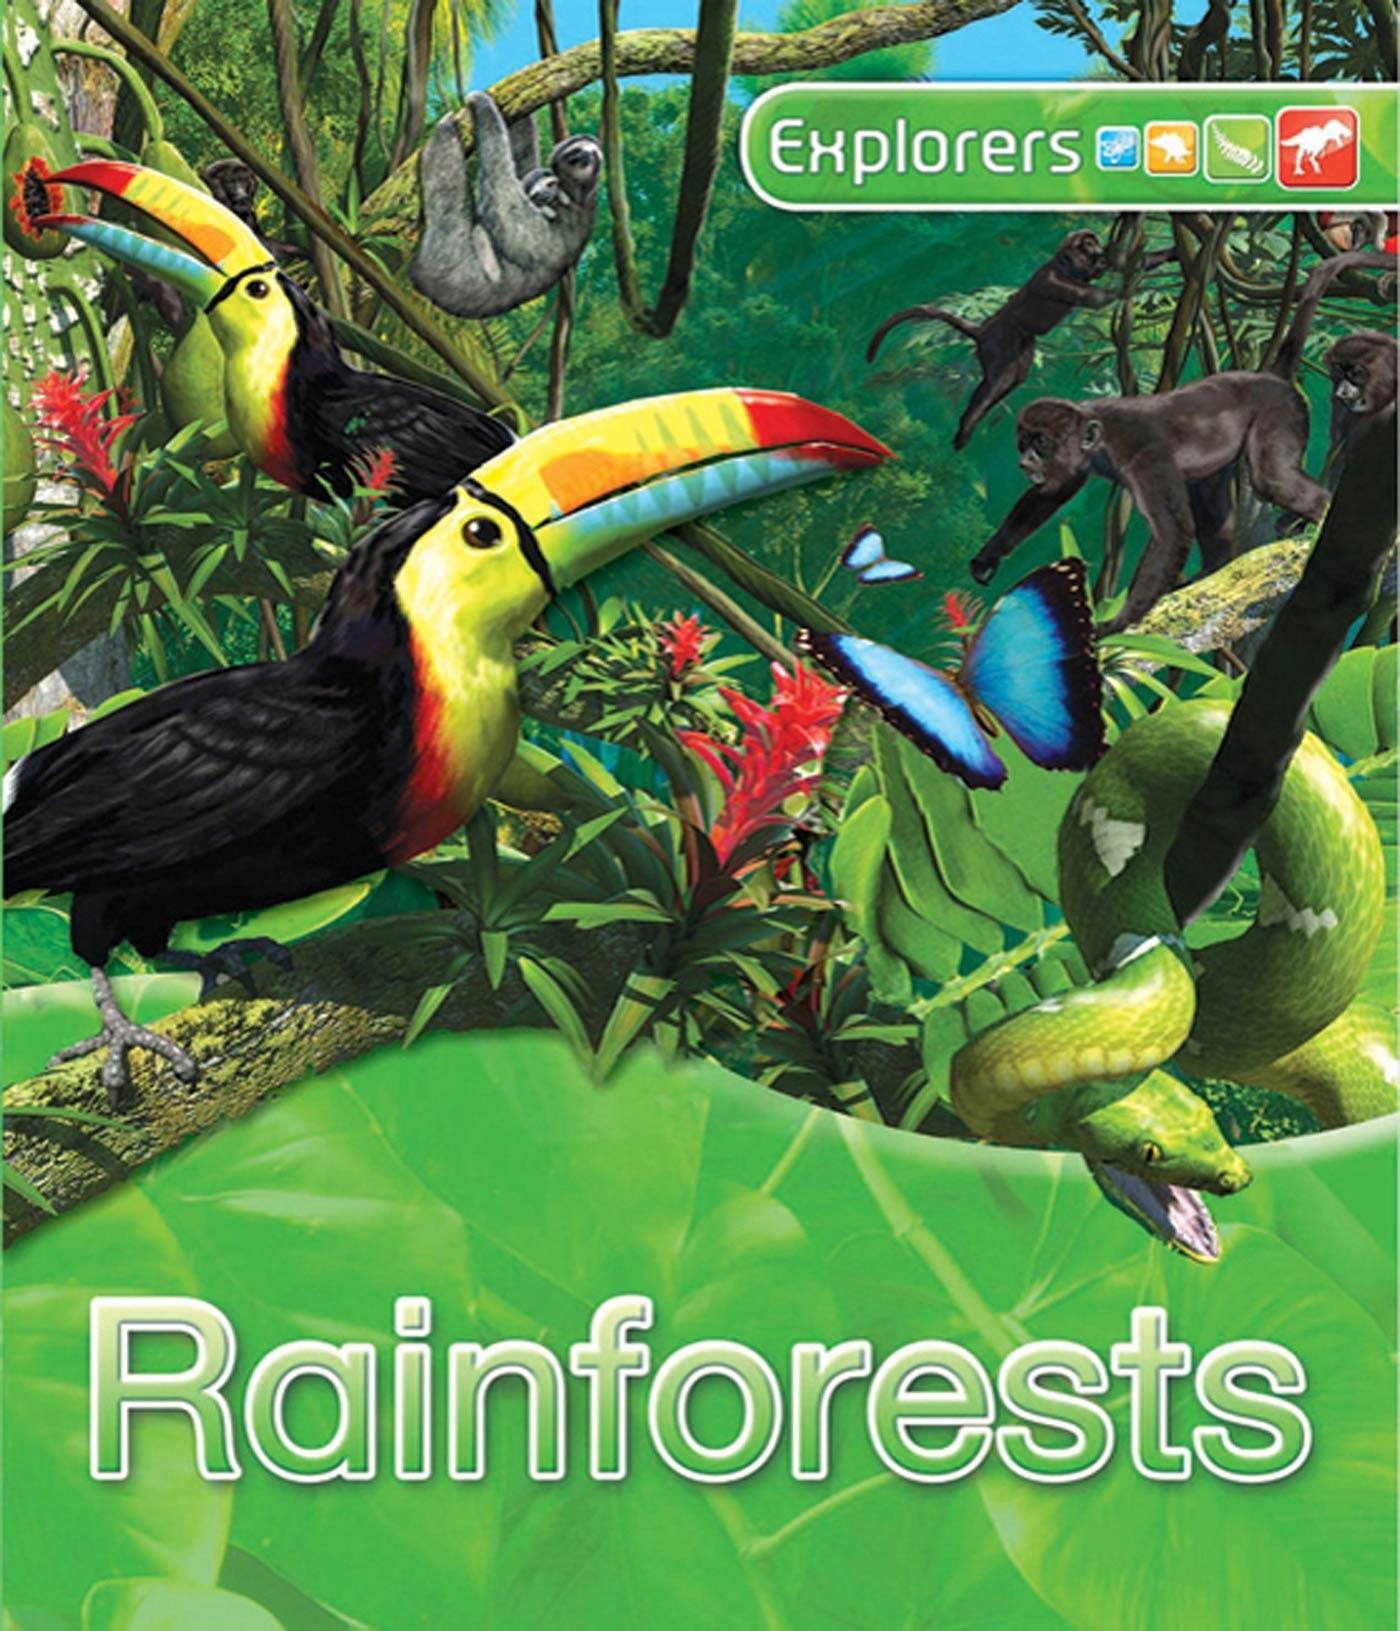 Image of Explorers: Rainforest